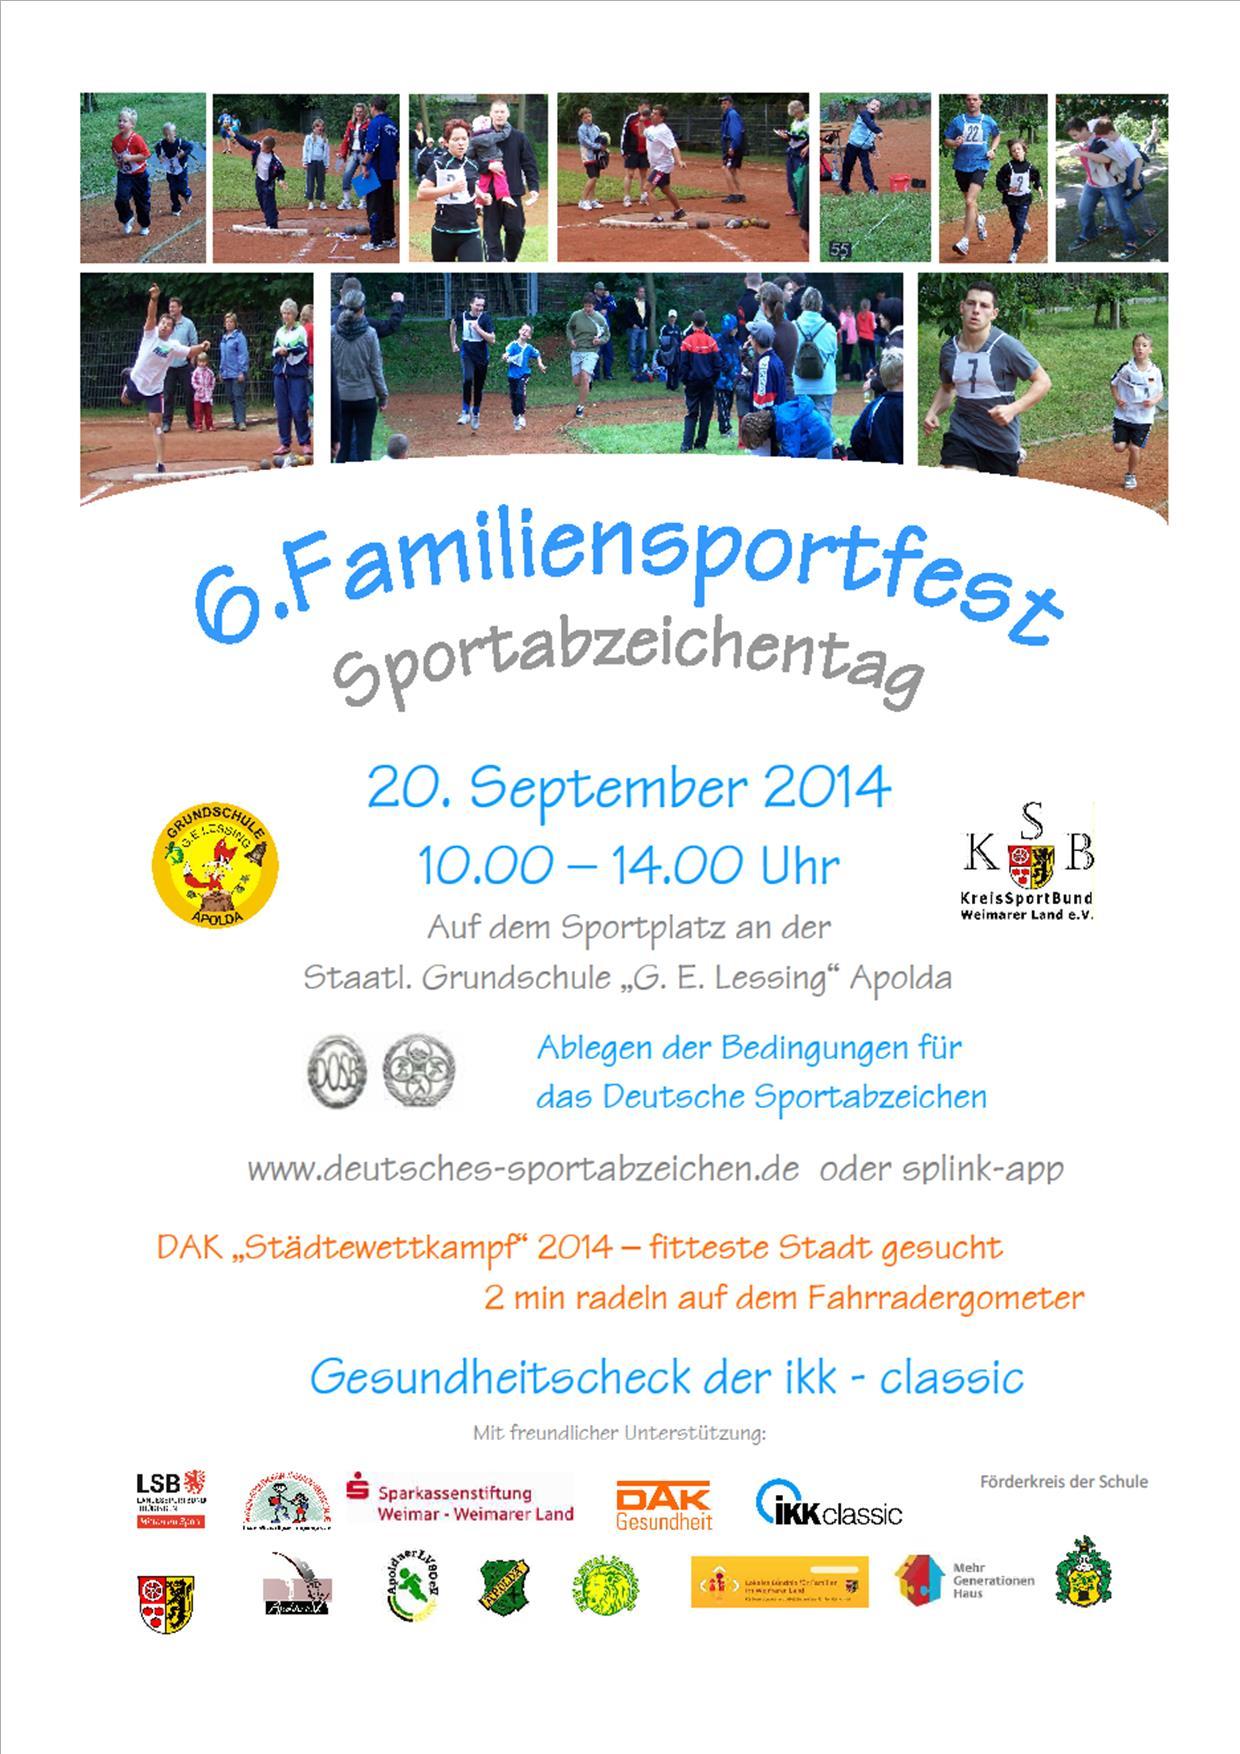 PLakat_Familiensportfest_2014